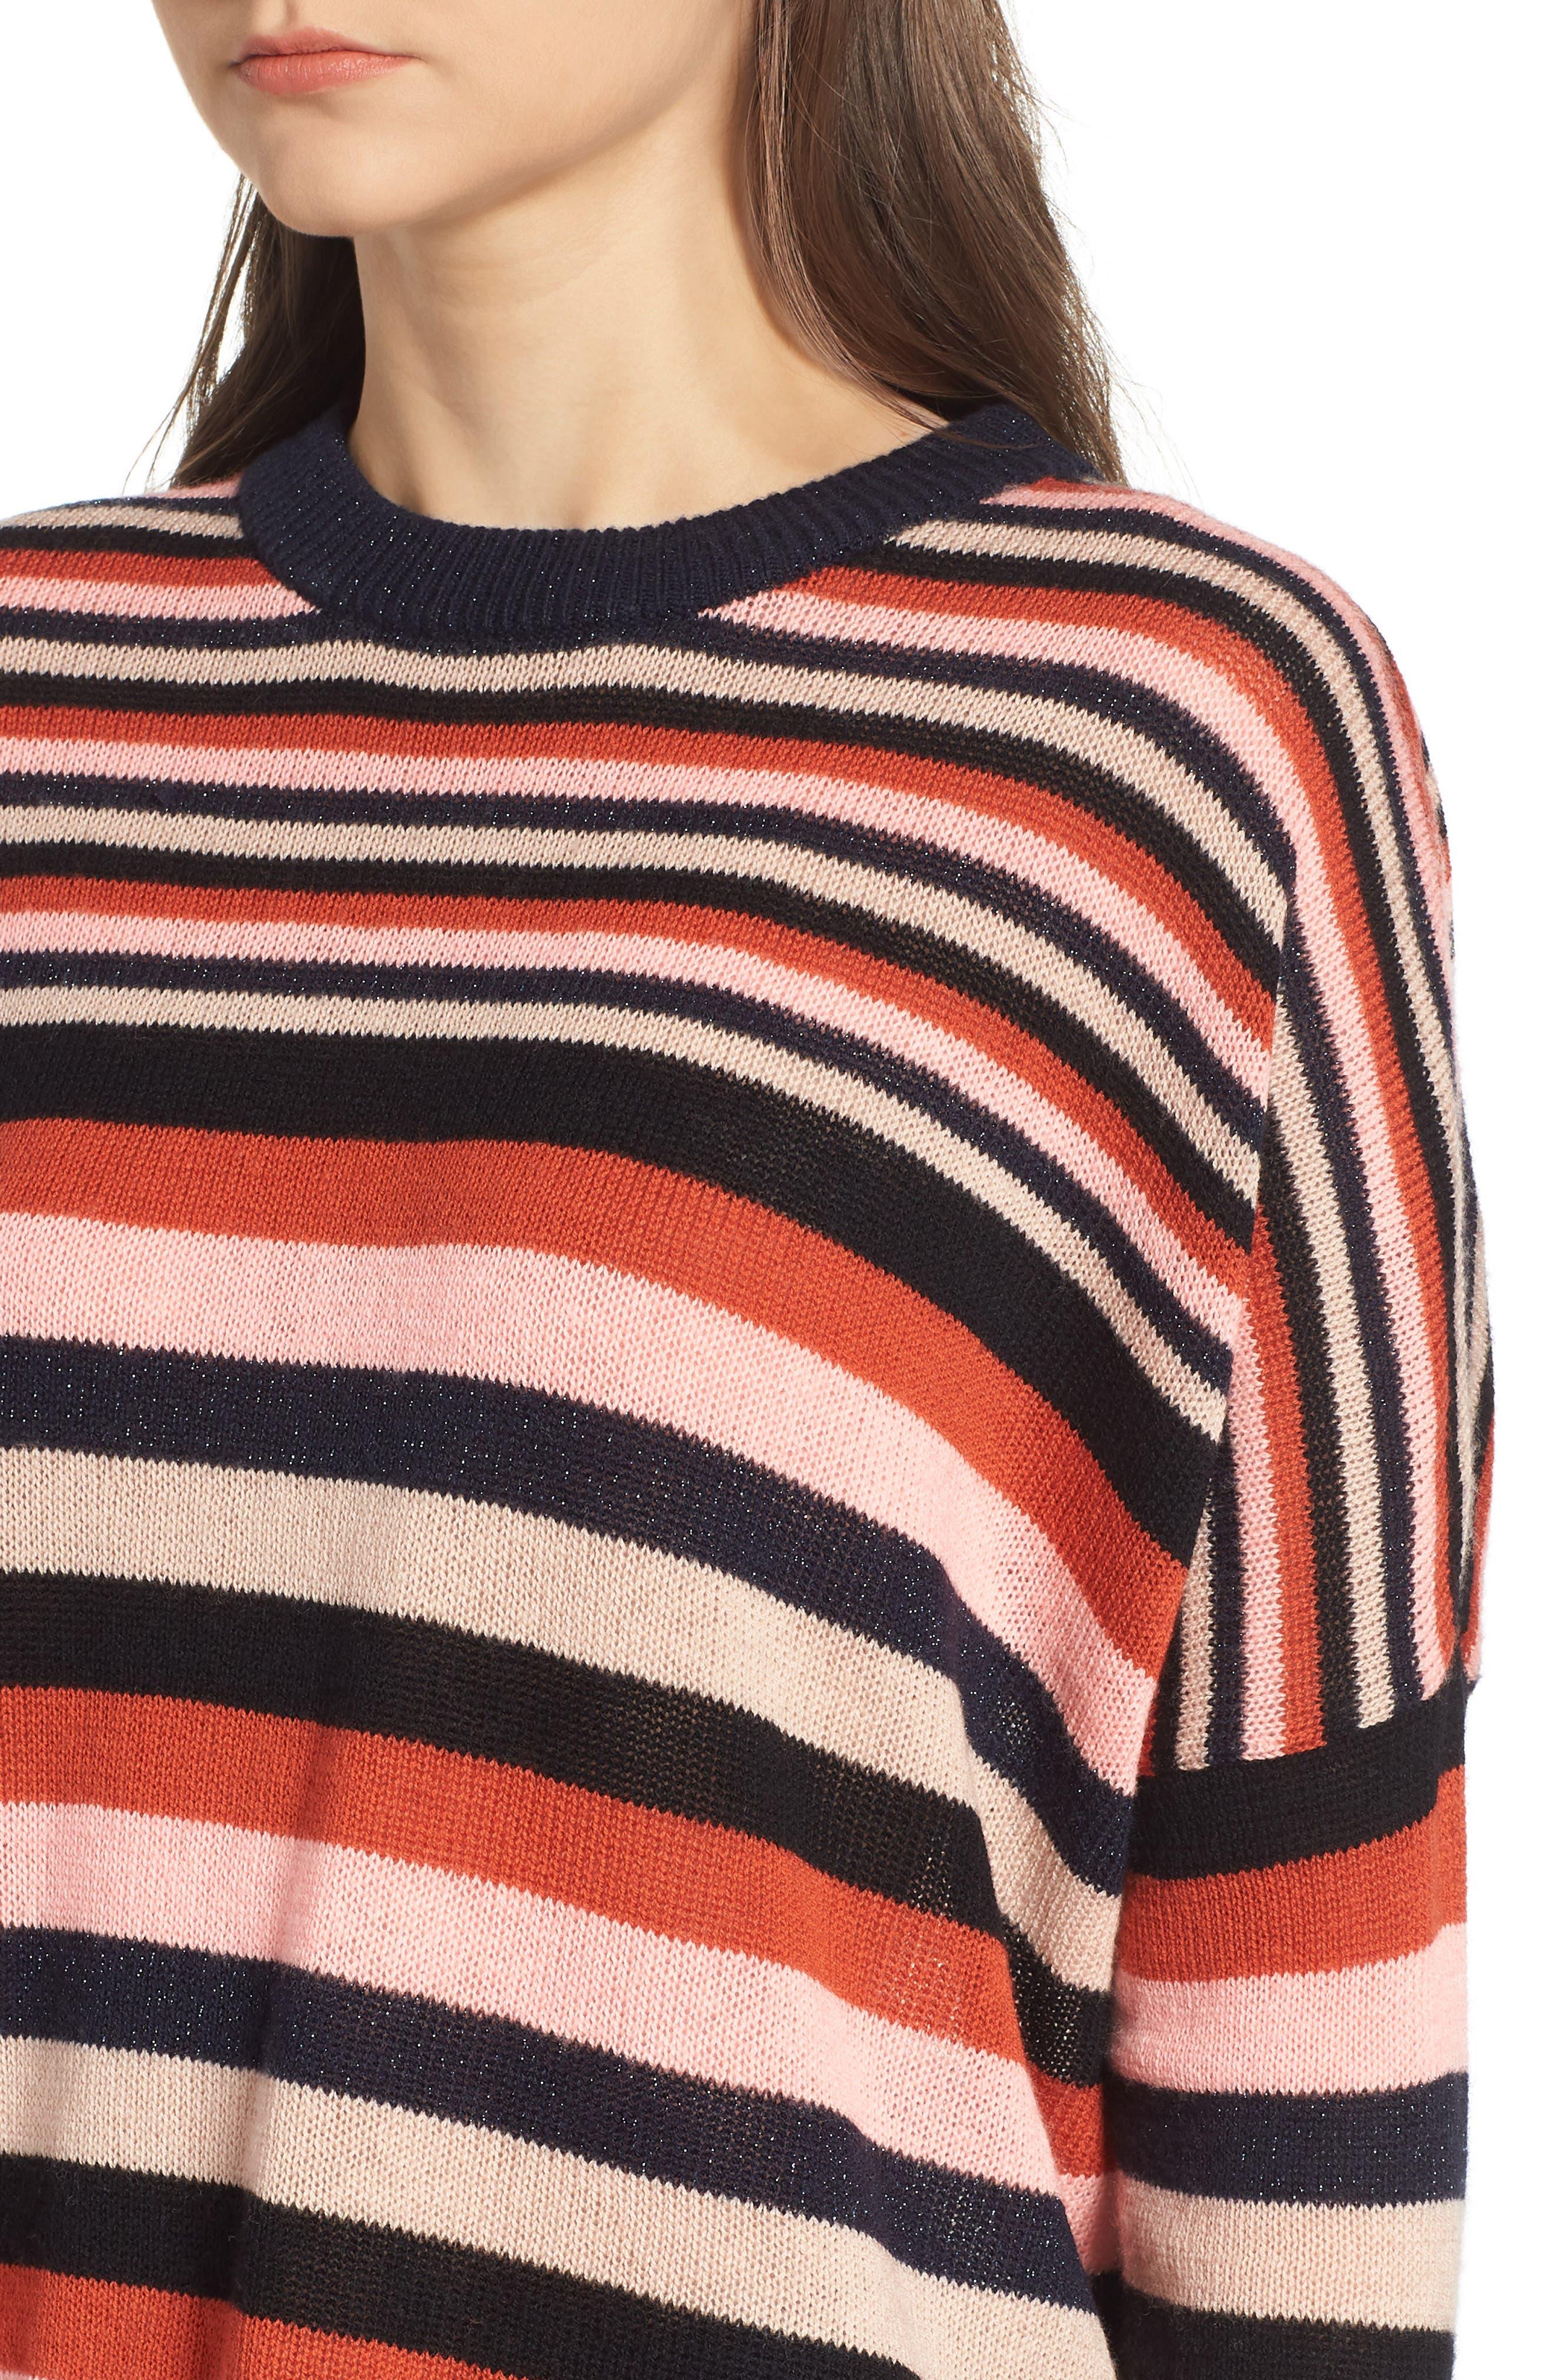 Stripe Sweater,                             Alternate thumbnail 4, color,                             PINK NAVY RUST STRIPE